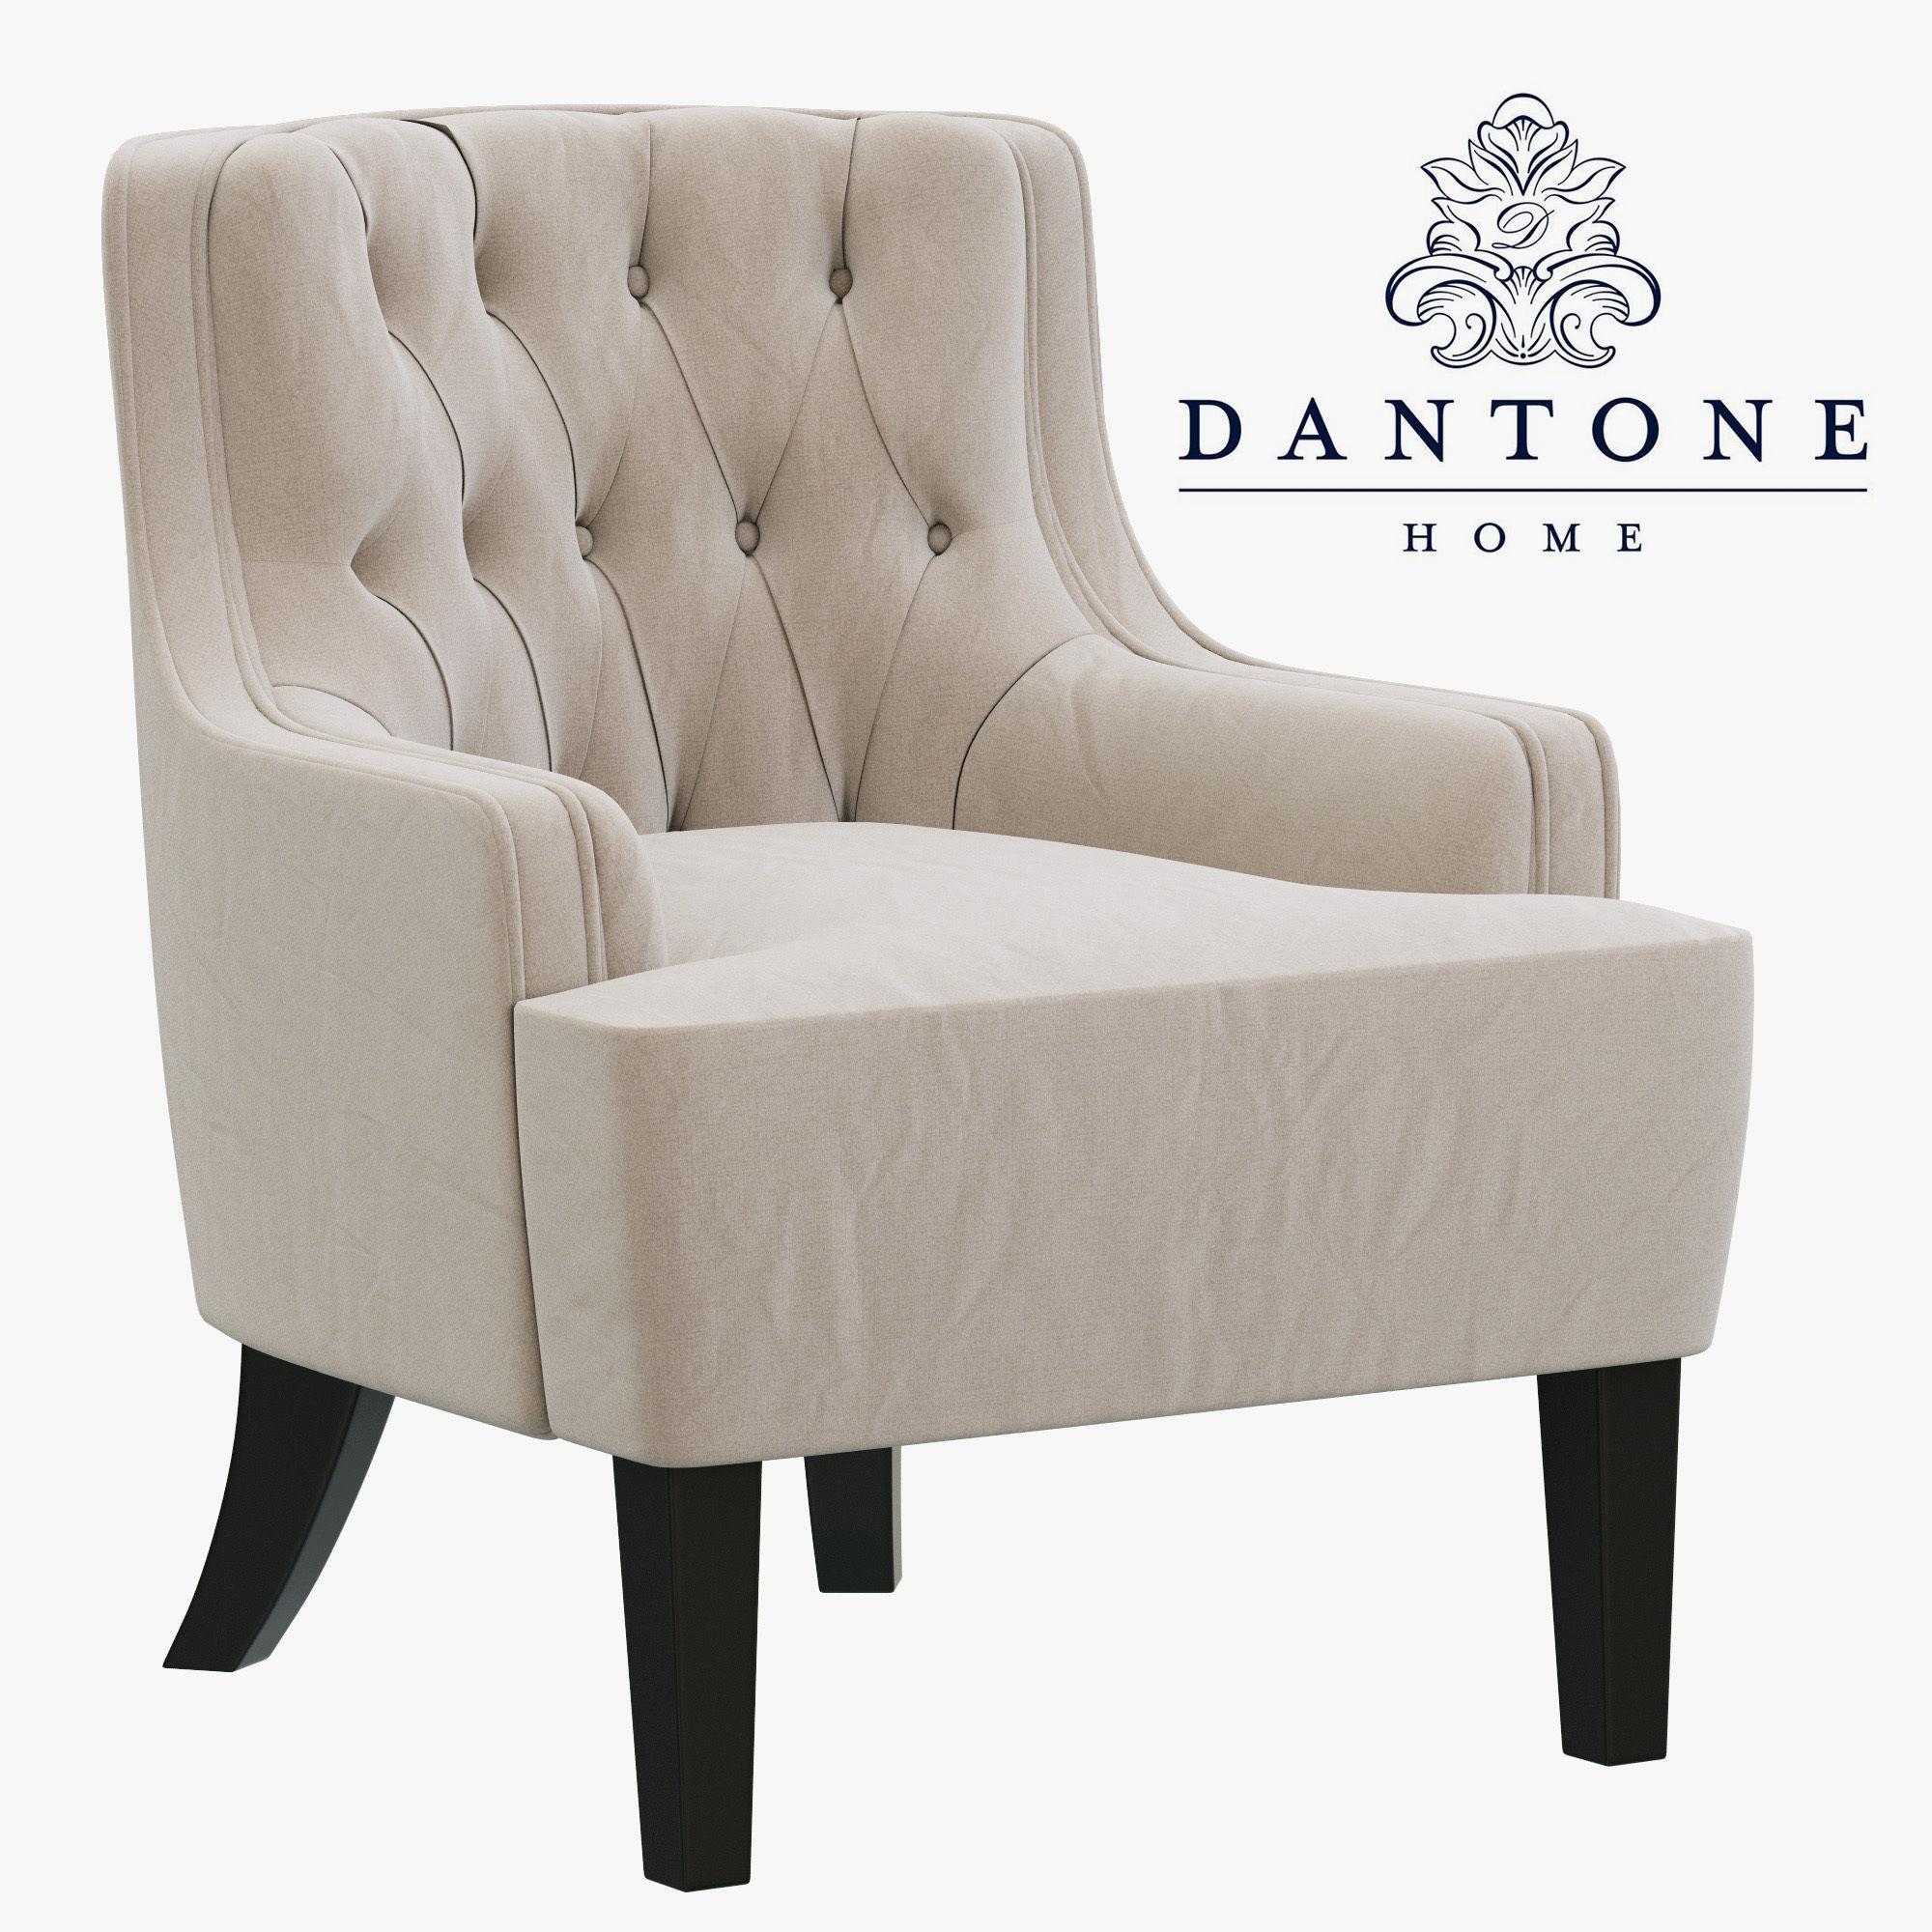 Dantone Home Richmond Chair 3D Model